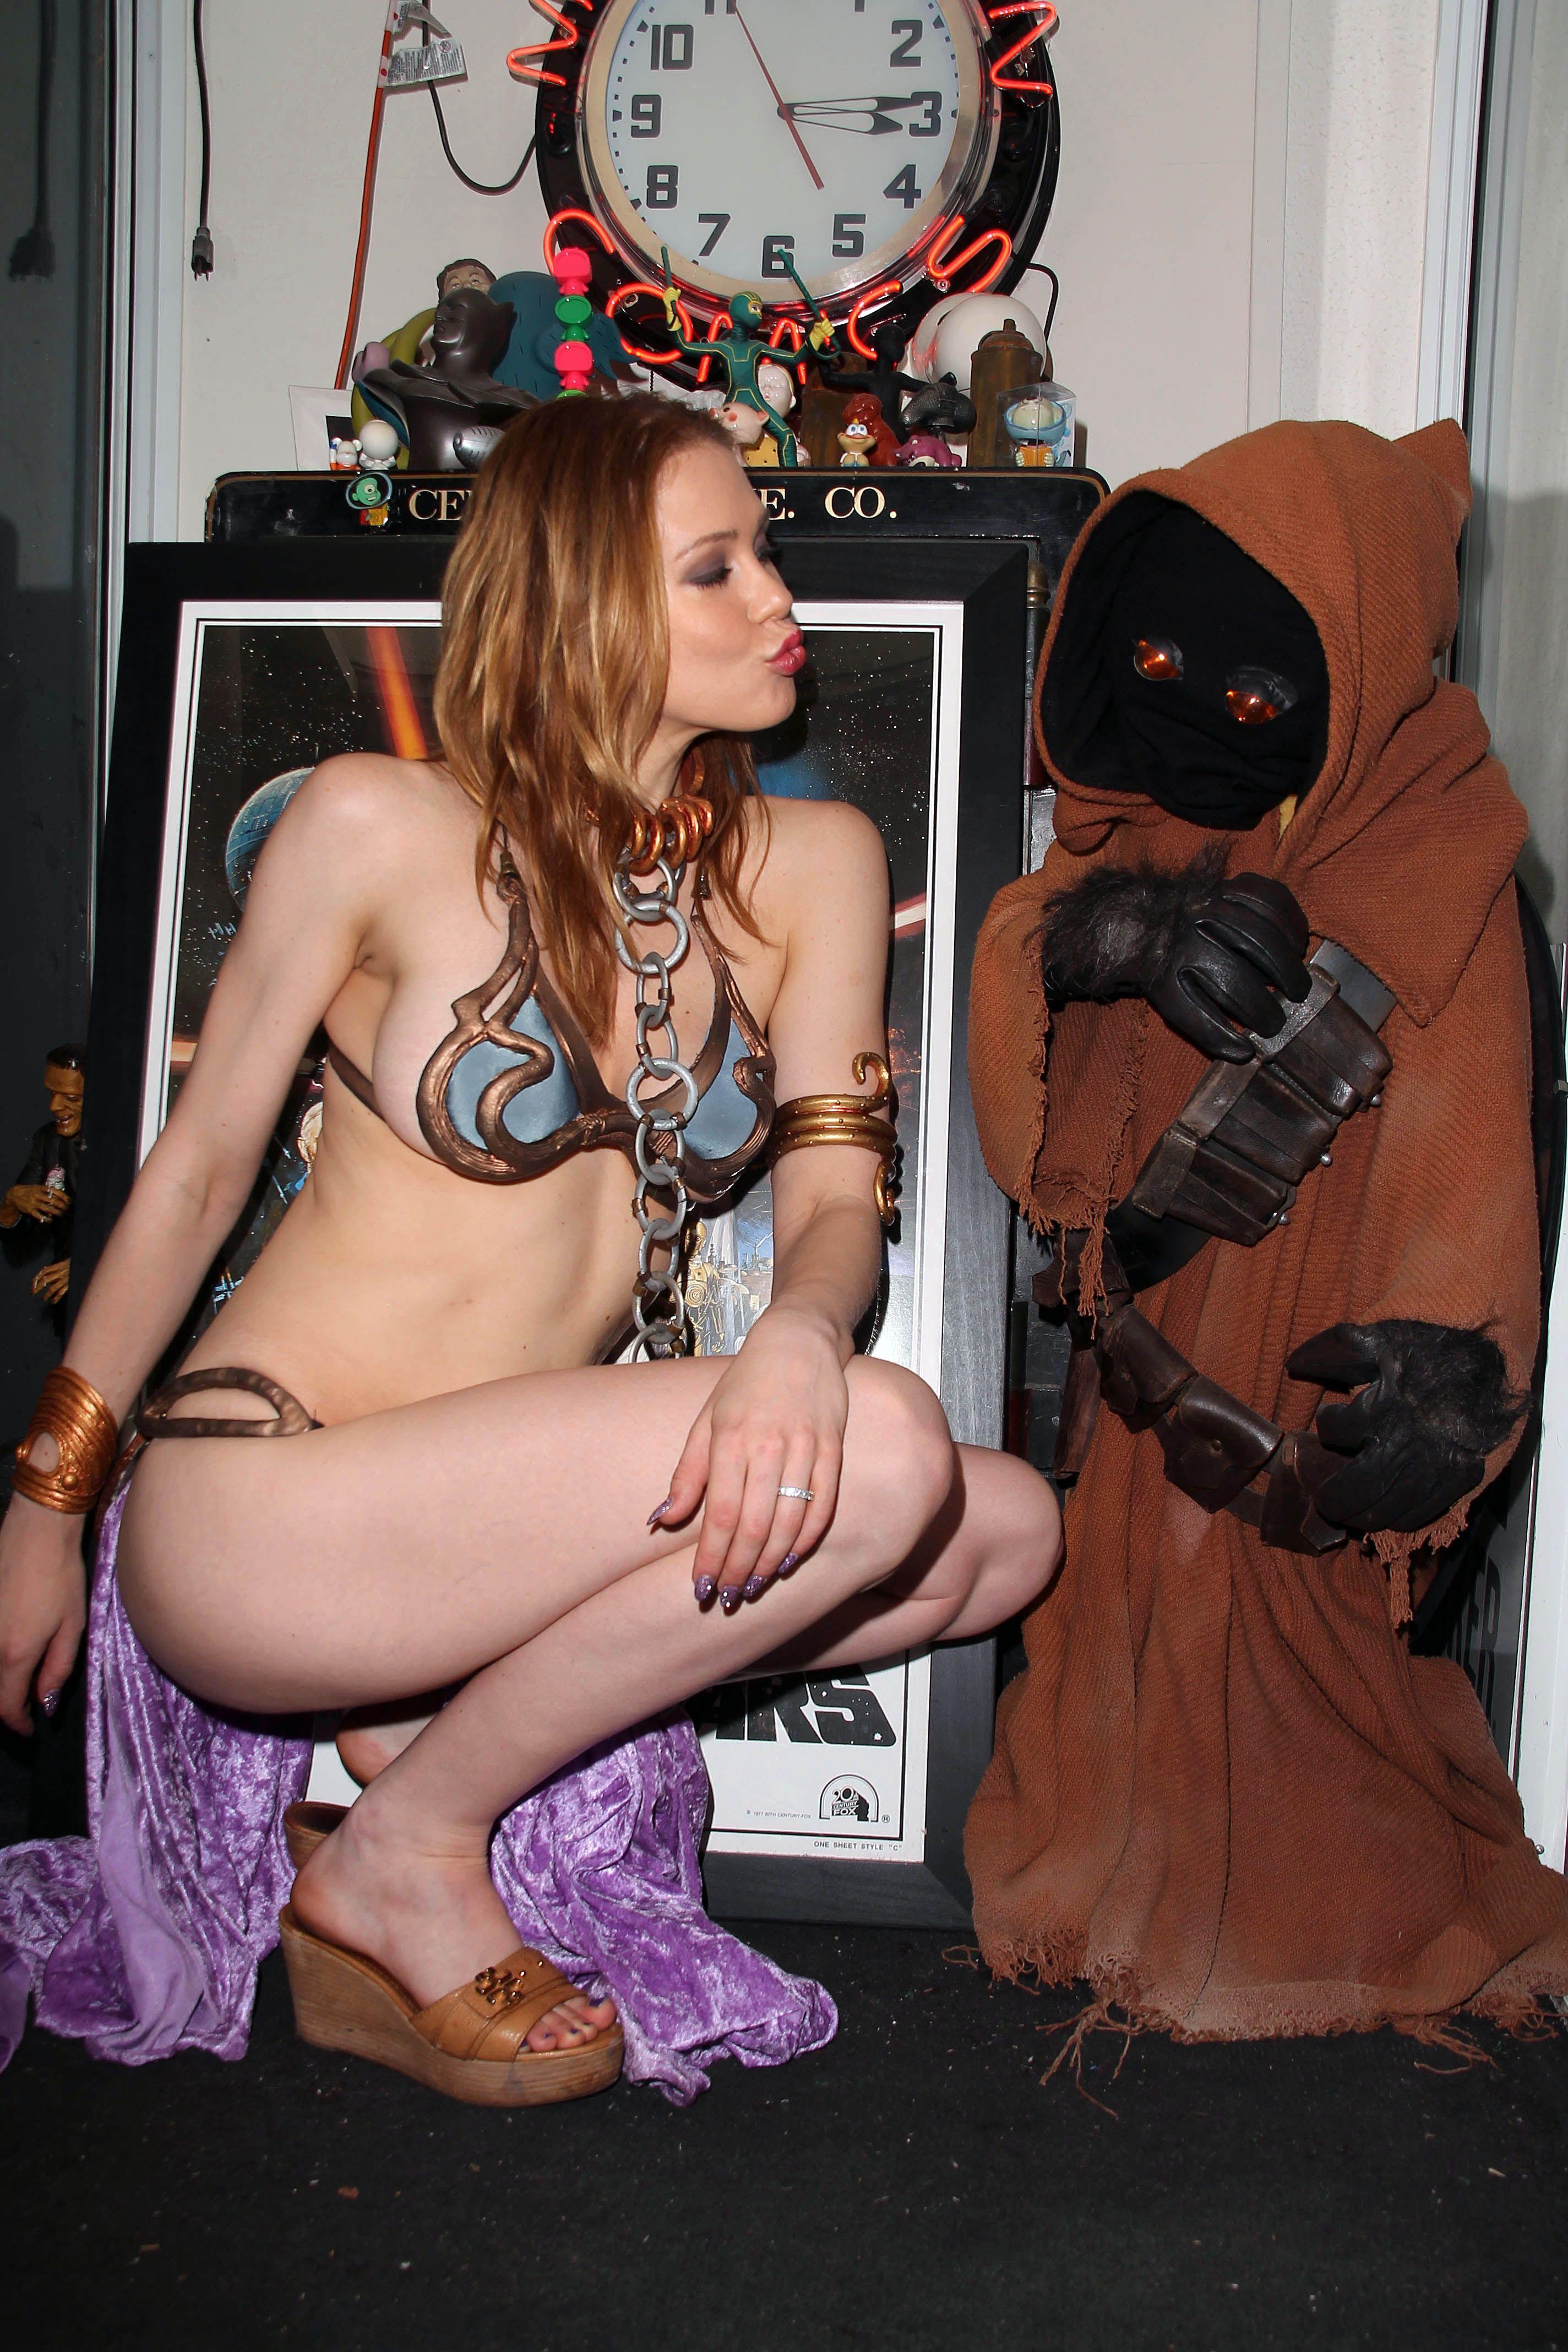 Jabba The Hutt Fucks Princess Leia Ideal maitland ward - princess leia photoshoot at meltdown comics in la